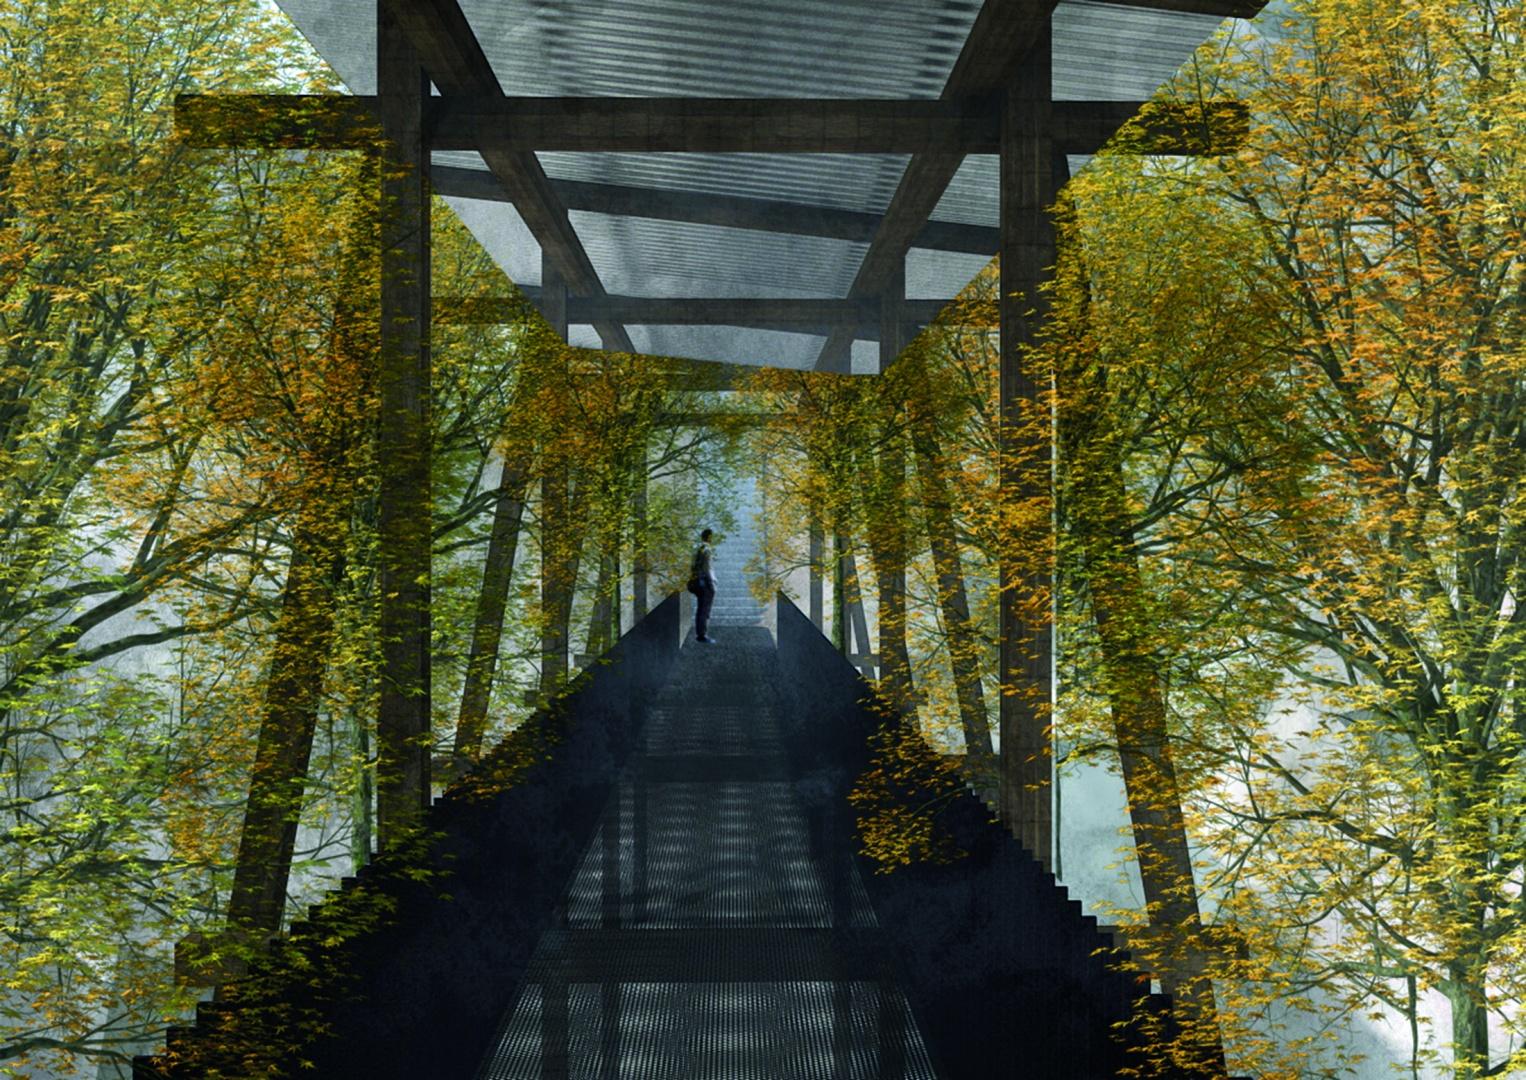 Wanderbrücke_04 © Davide Vinciguerra